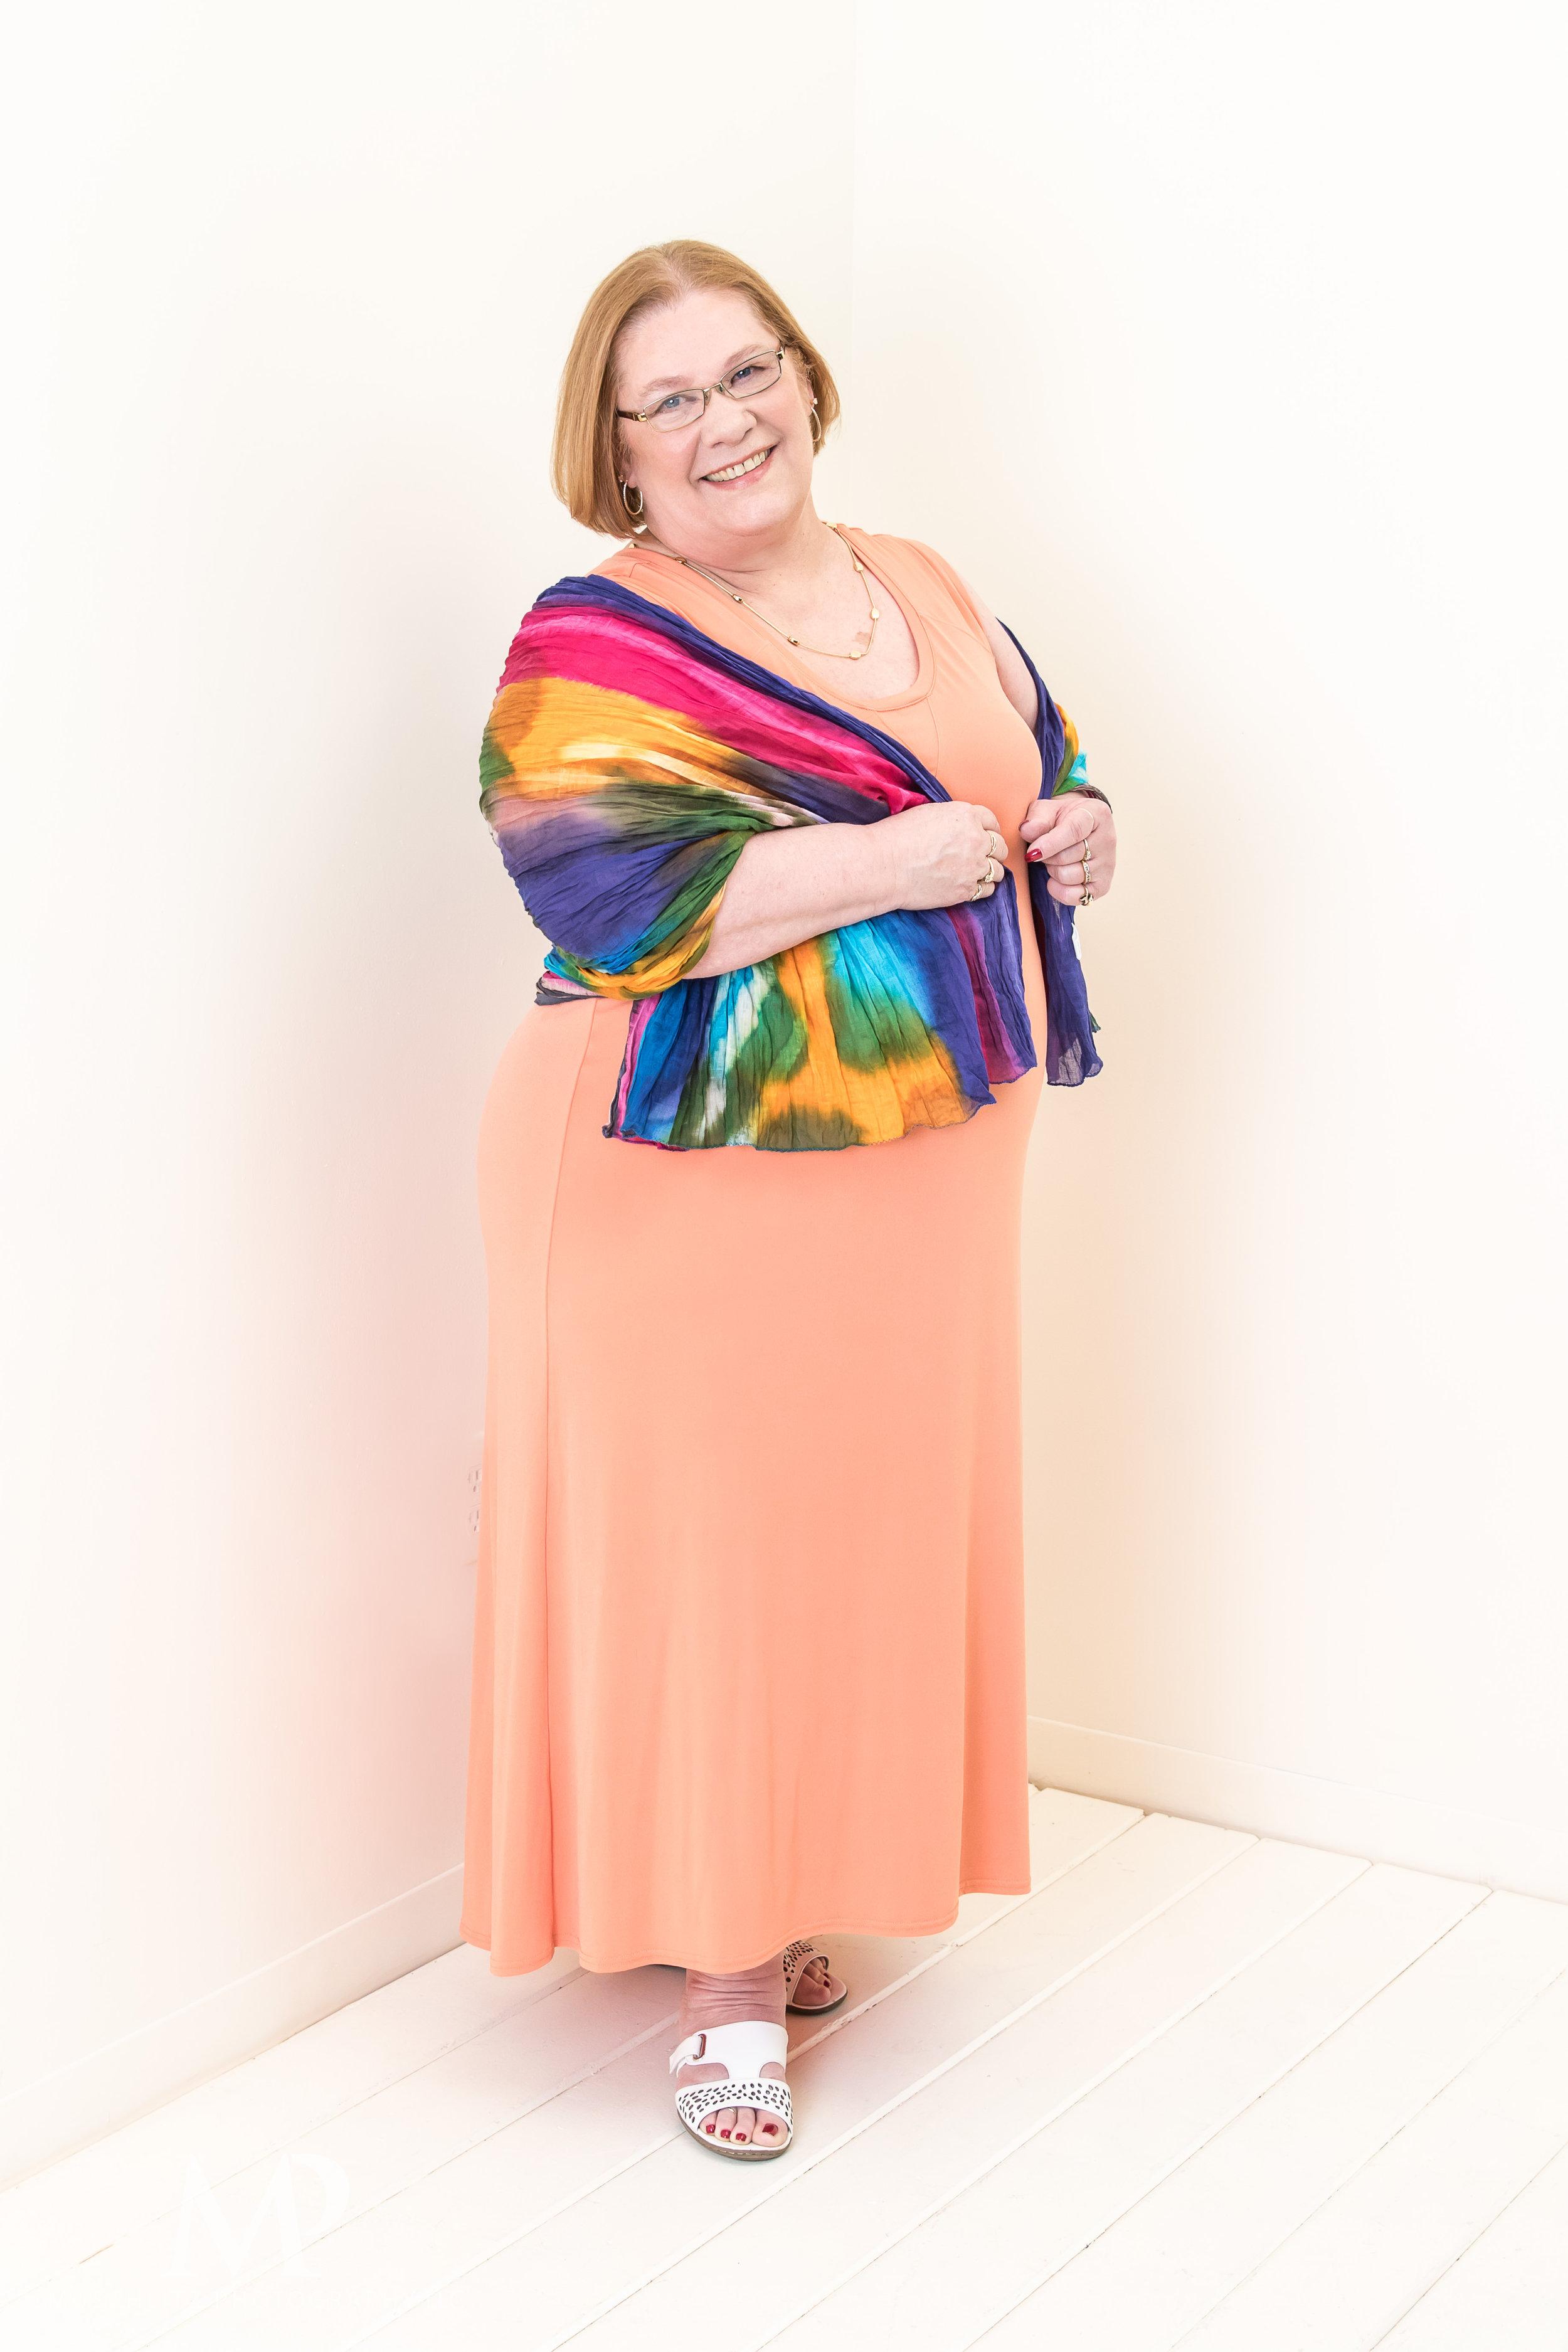 beauty-glamour-65-birthday-portrait-session-portraits-columbus-ohio-muschlitz-photography-030.JPG